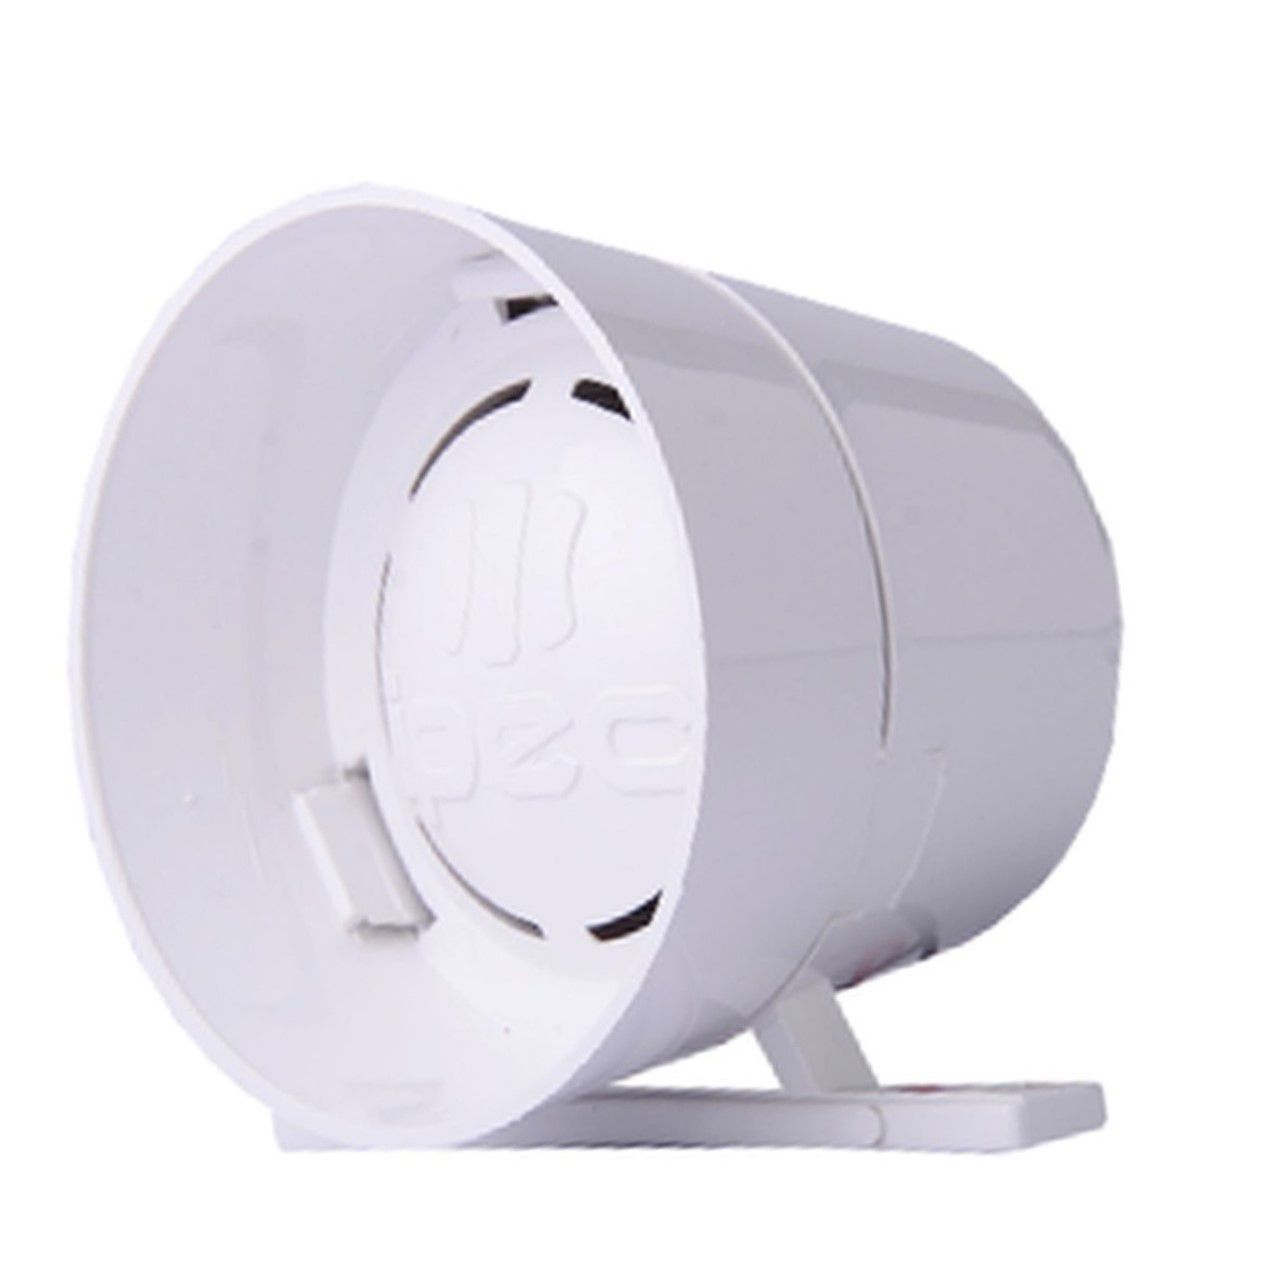 Sirene Piezoelétrica Para Alarme Cerca Elétrica 1 Som Branca Ipec A3059-B  - EMPORIO K